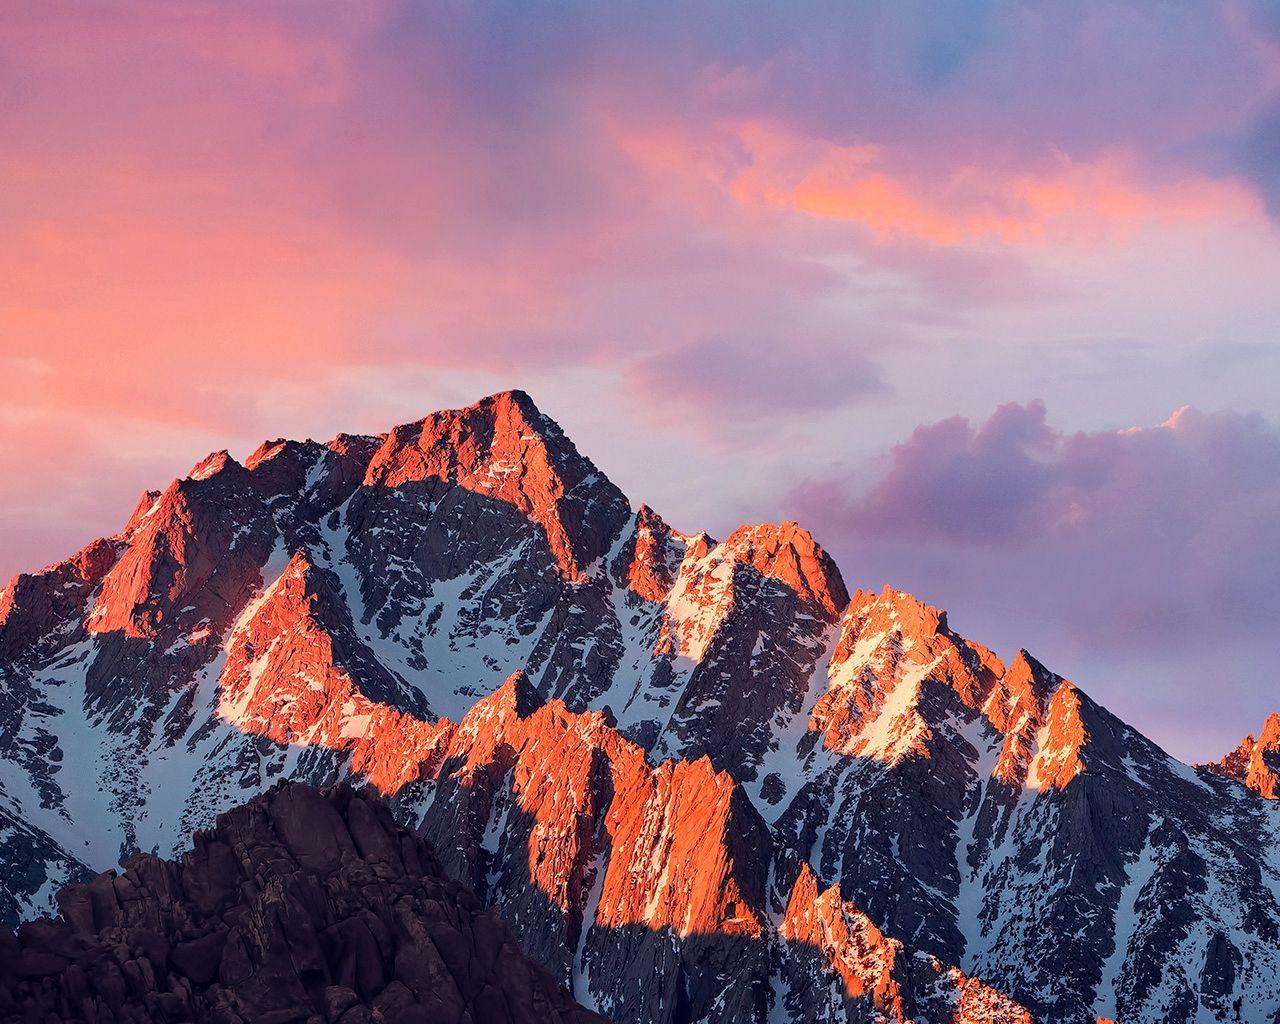 Mac Wallpaper 4k Yosemite Gallery Latar Belakang Kertas Dinding Wallpaper Ponsel